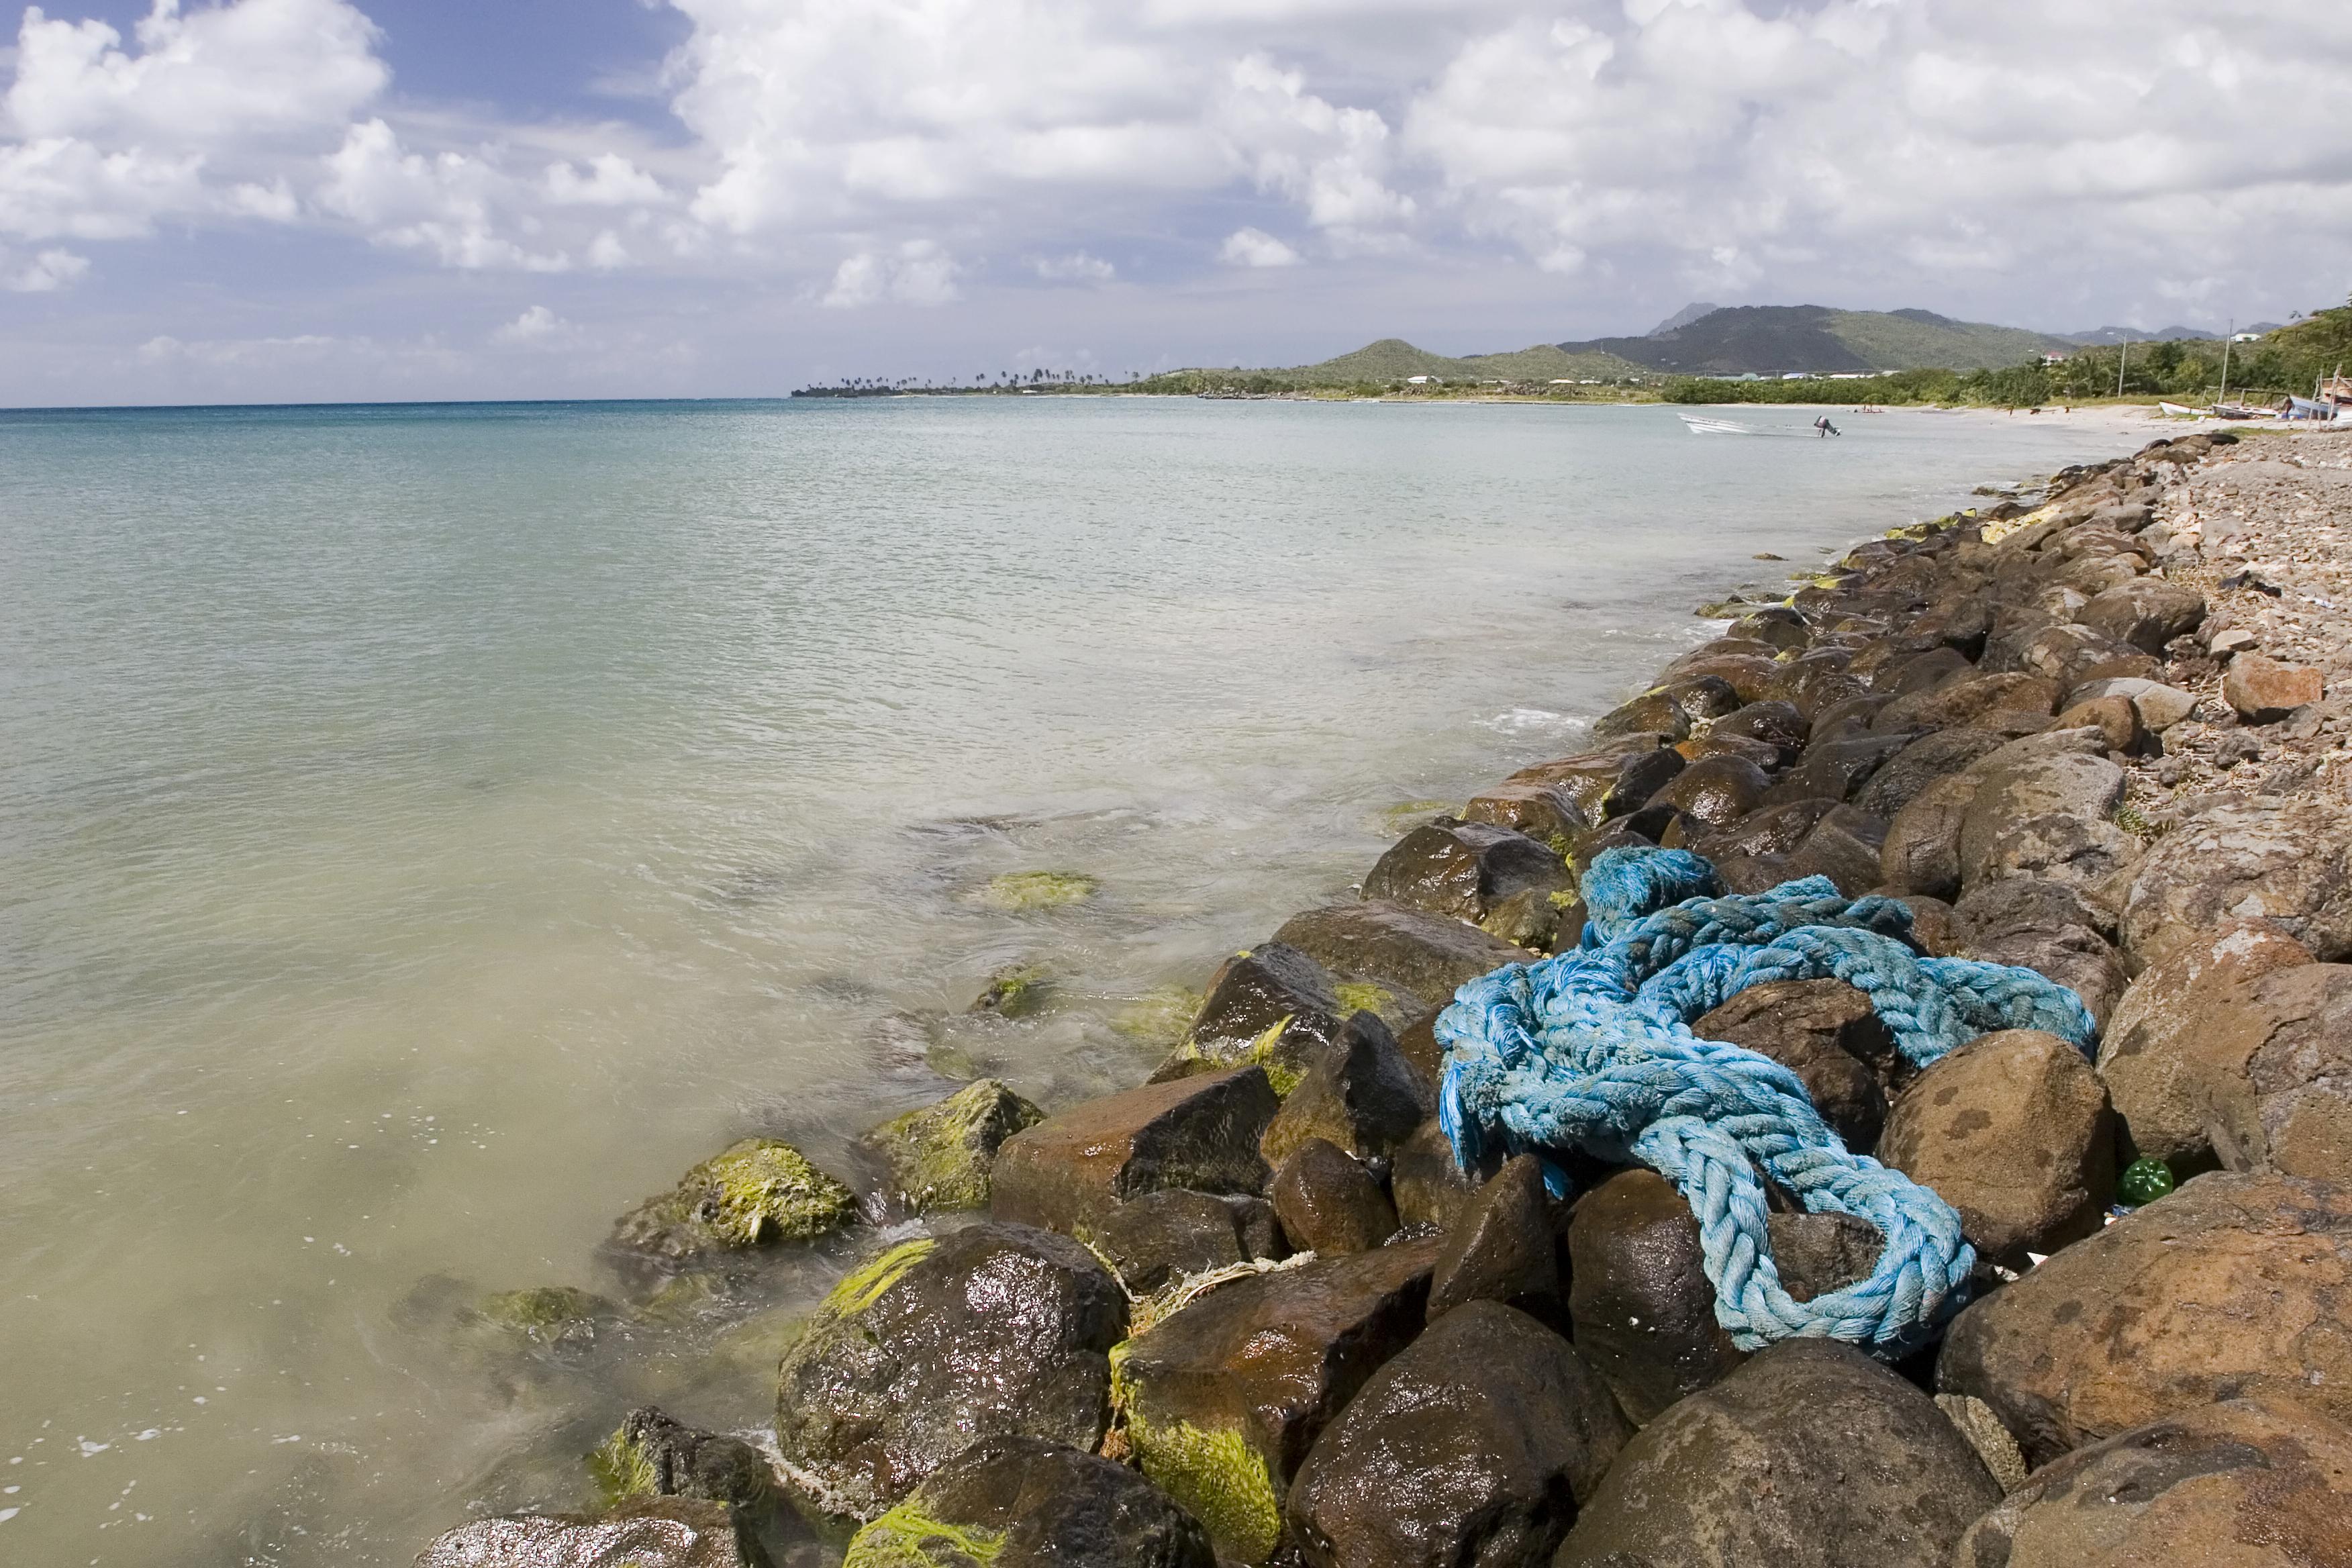 Coast at Laborie, St Lucia